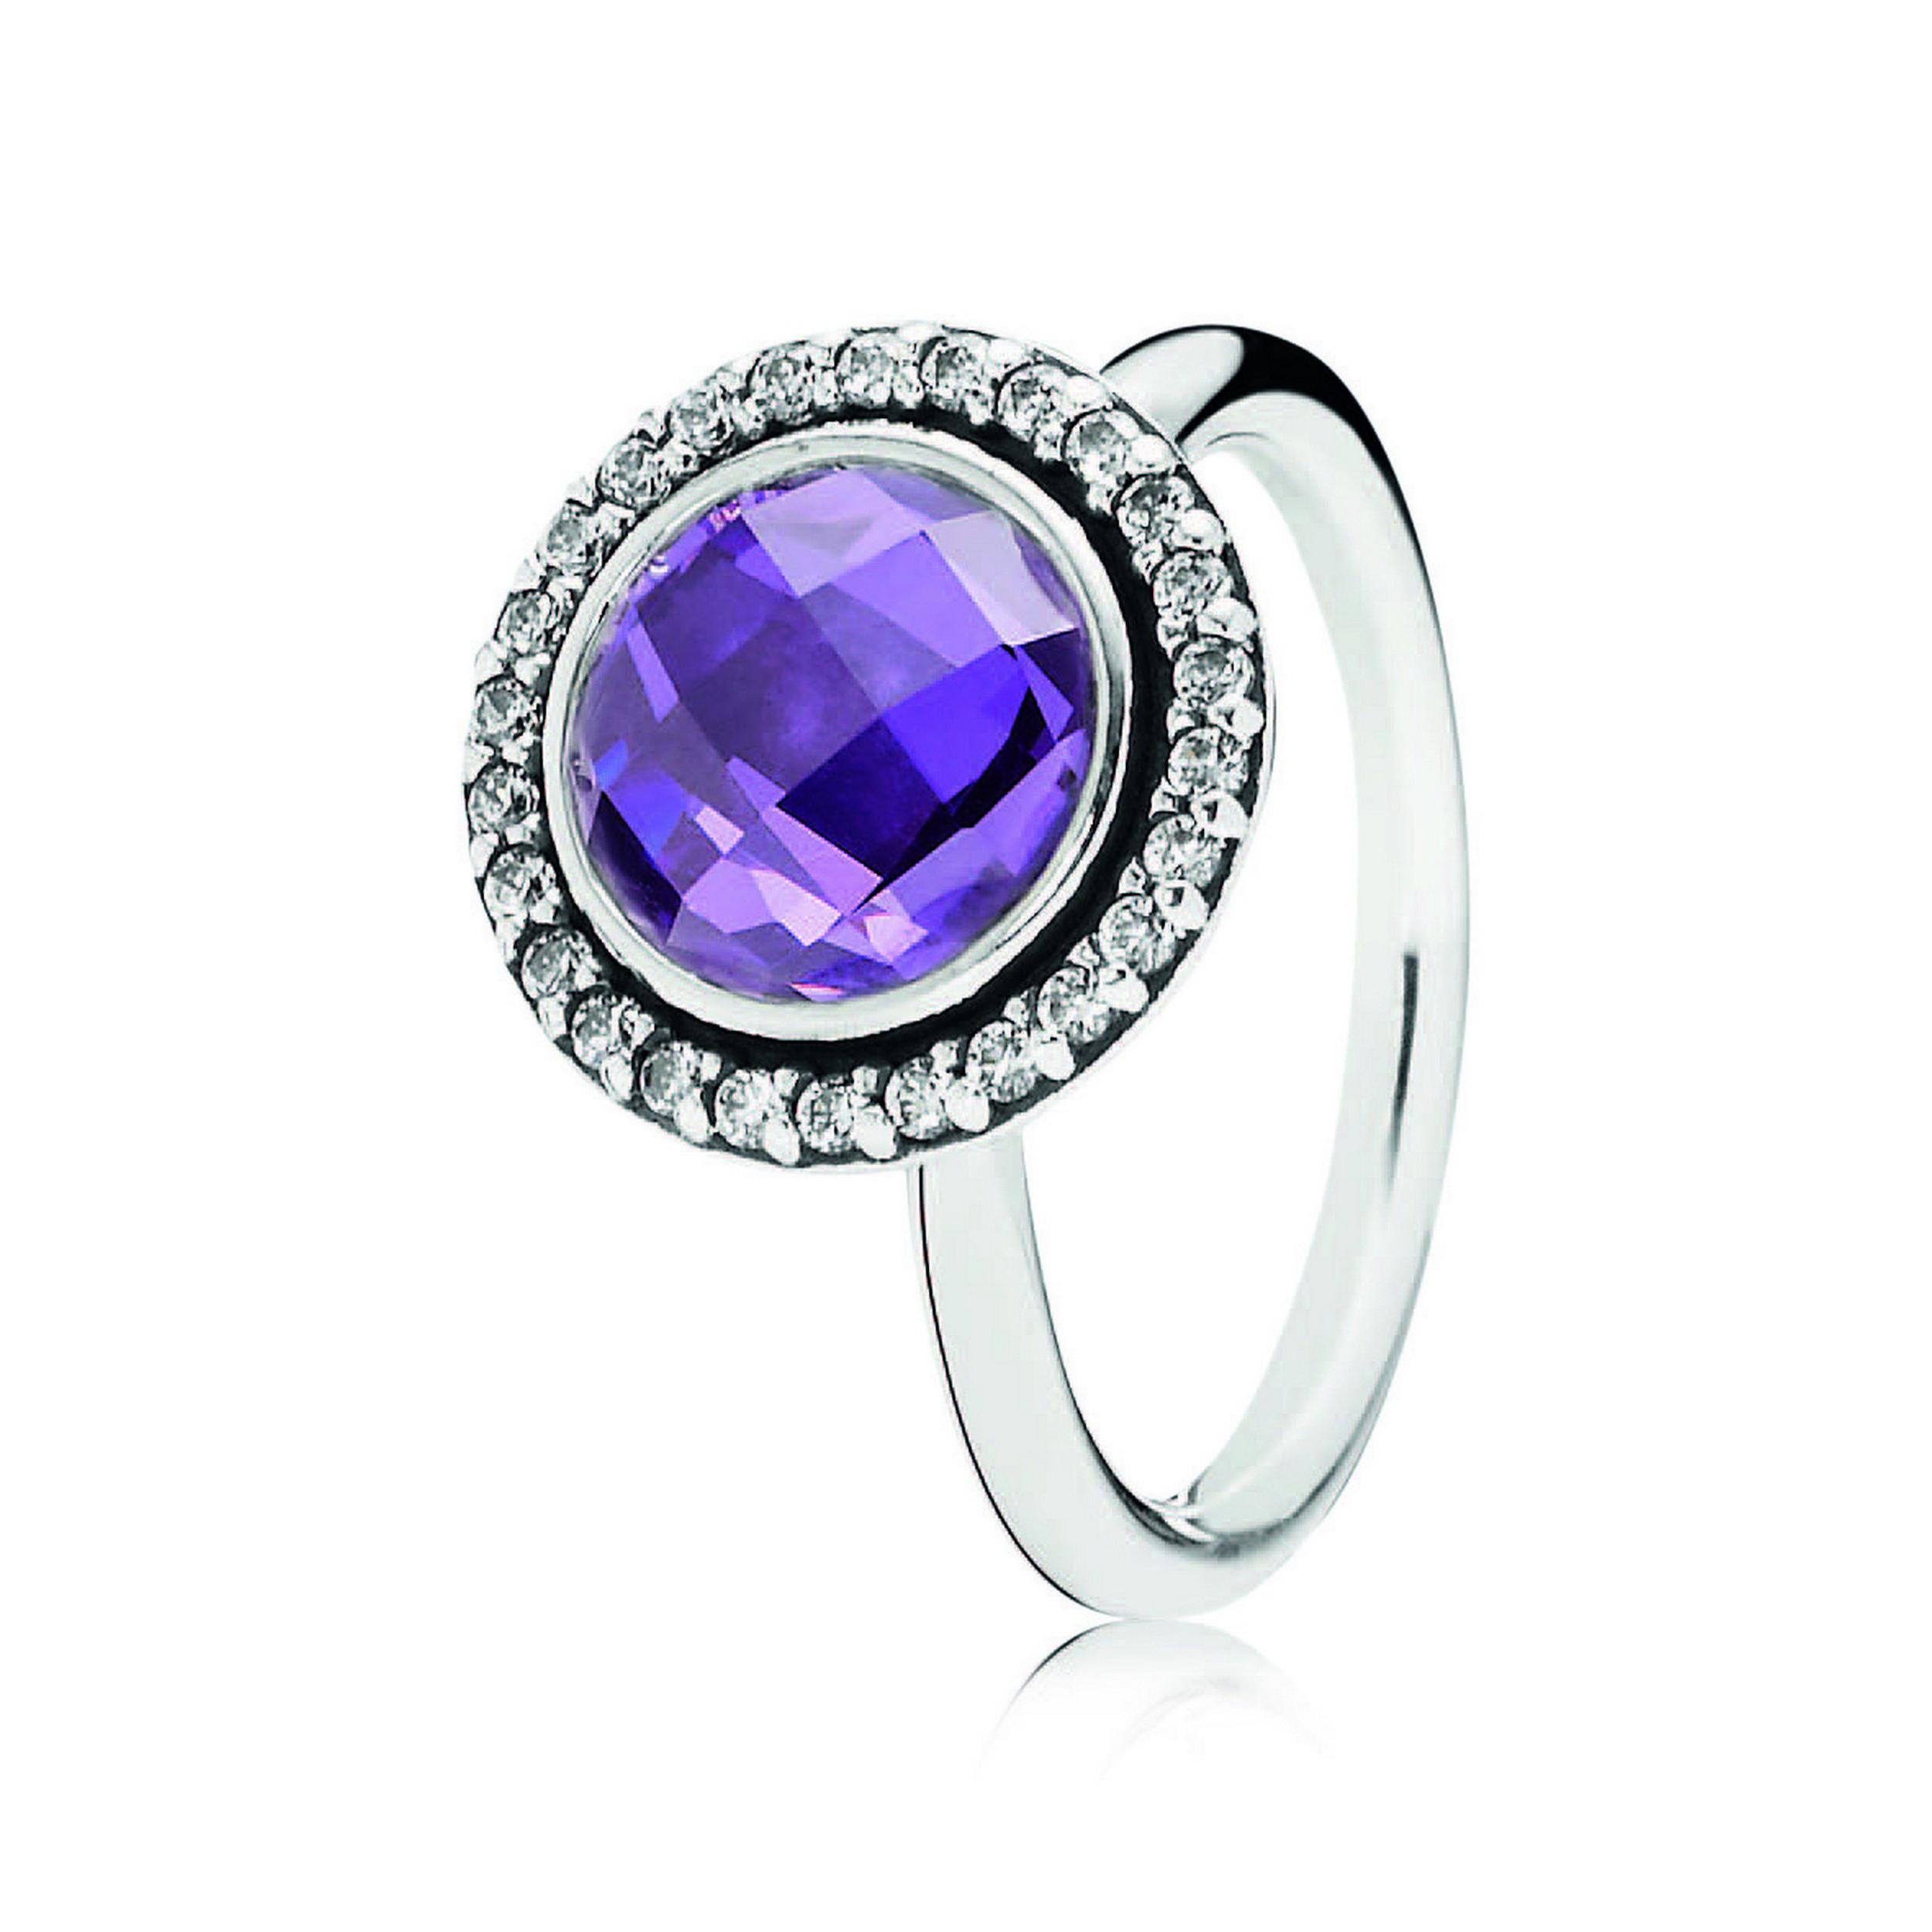 PANDORA_Spring 2014_Silver Cocktail Ring with Purple Cubic Zirconia_HK$999.jpg